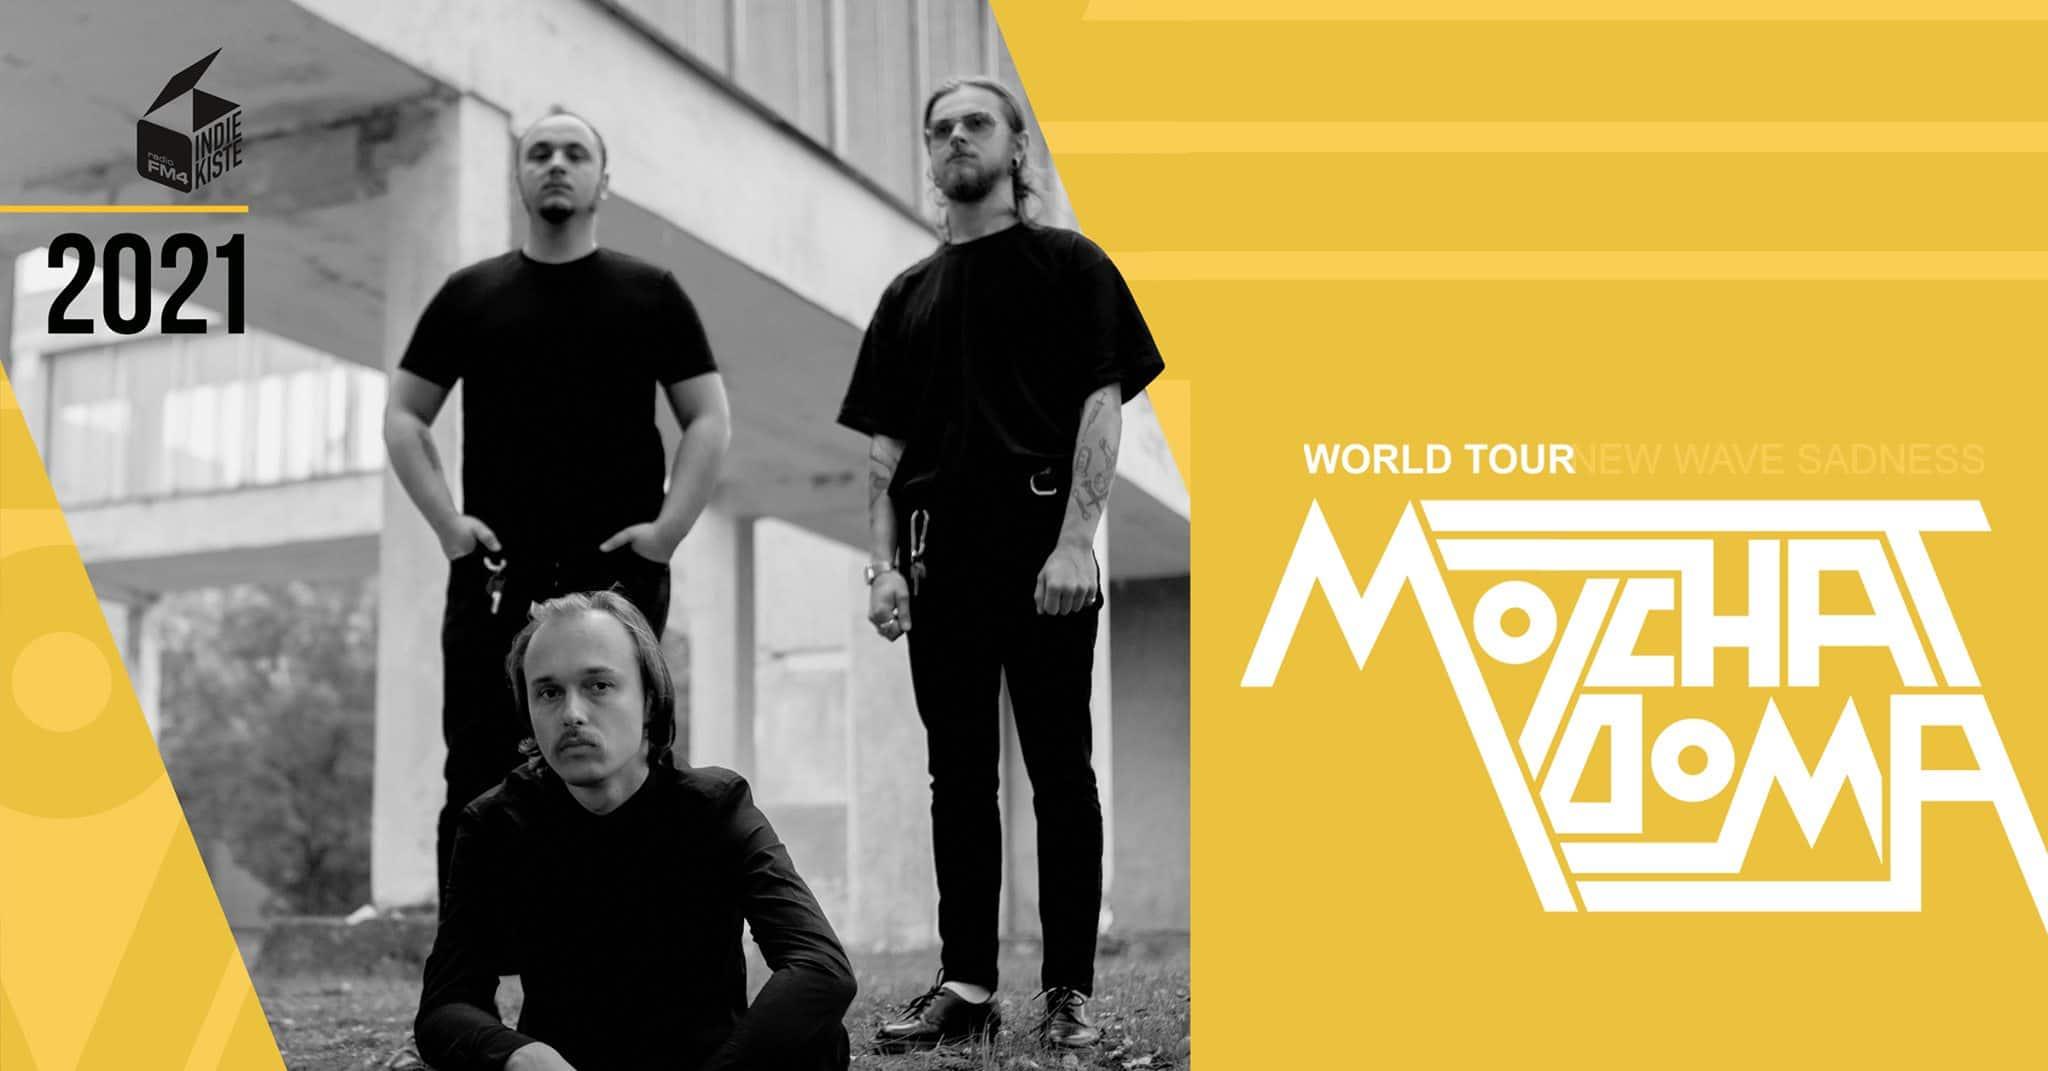 Events Wien: FM4 Indiekiste mit Molchat Doma